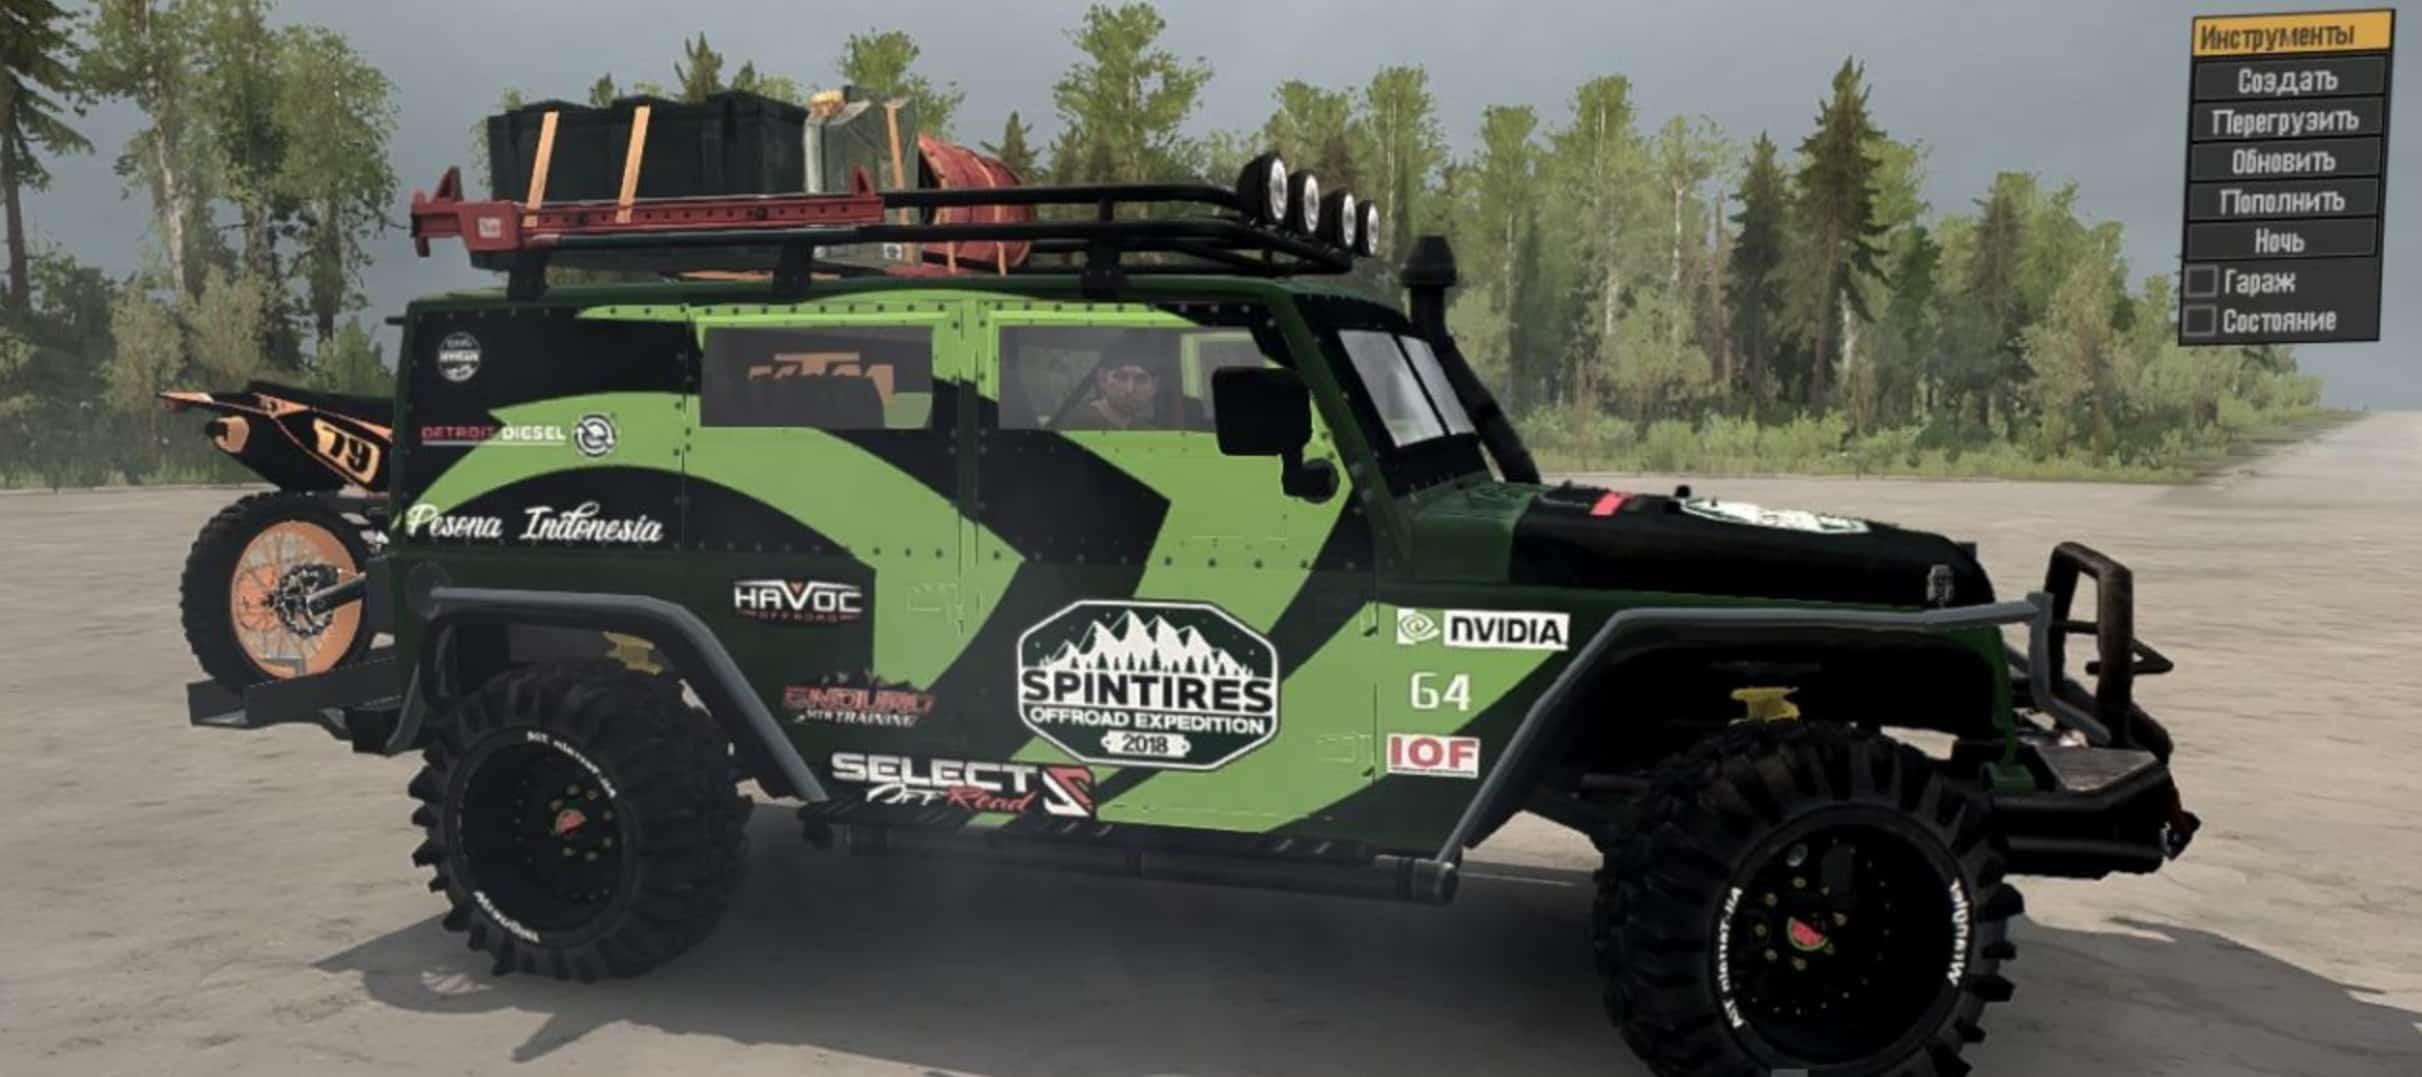 Jeep Wrangler Diesel >> Jeep Wrangler Diesel V30 01 18 Spintires Mudrunner Mod